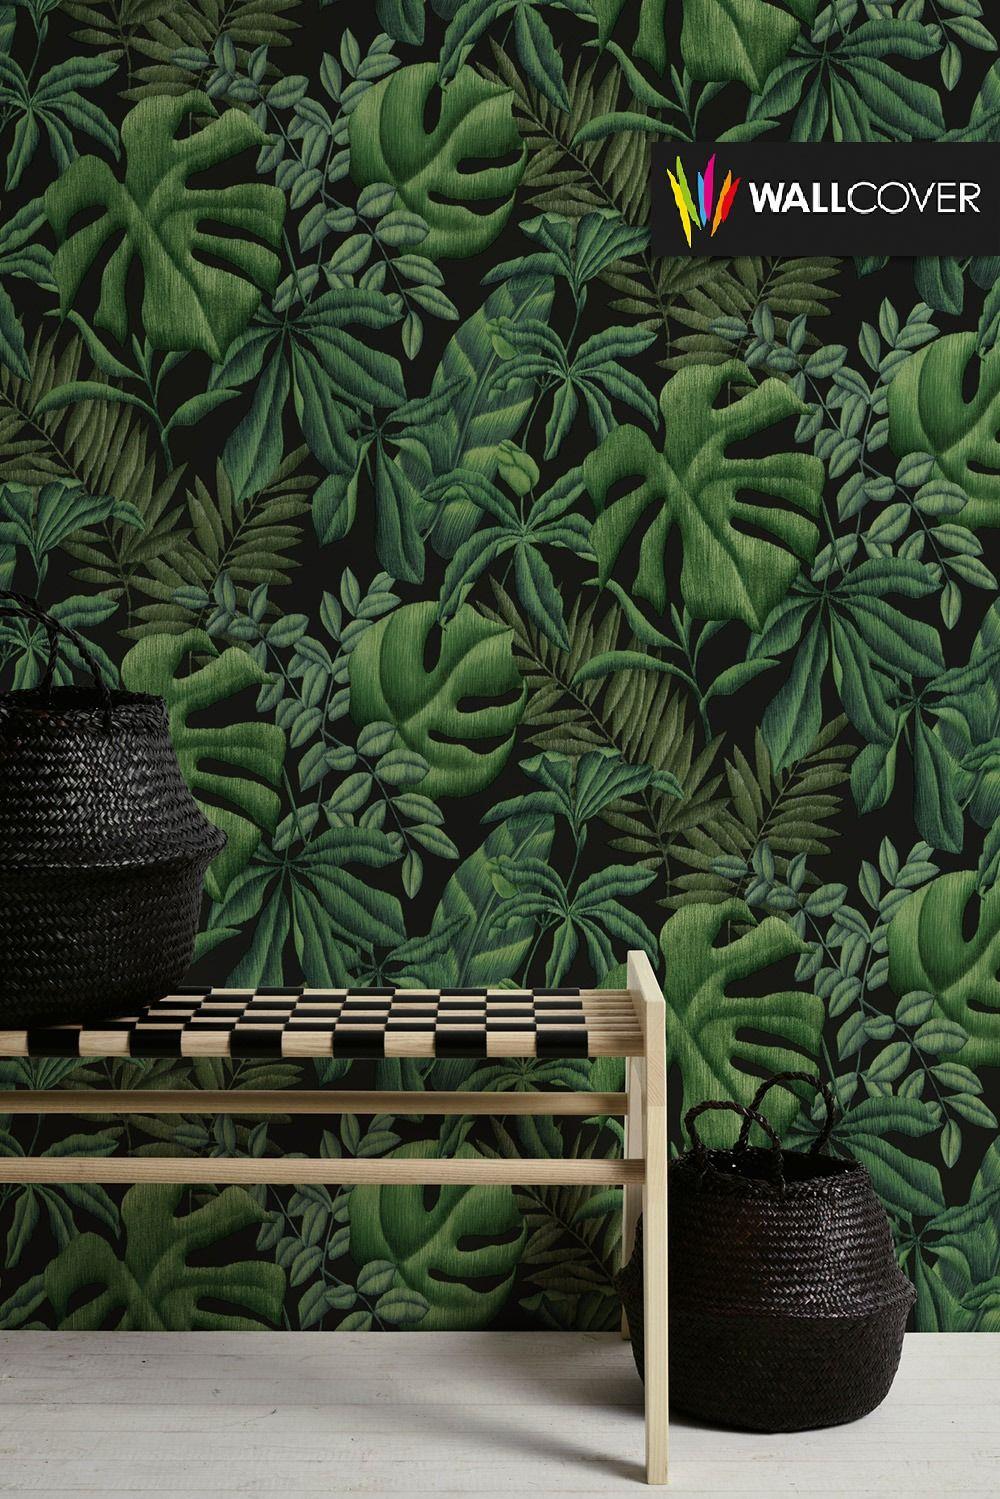 What Is Vinyl Wallpaper Jungle Wallpaper Tree Wallpaper Green Wallpaper